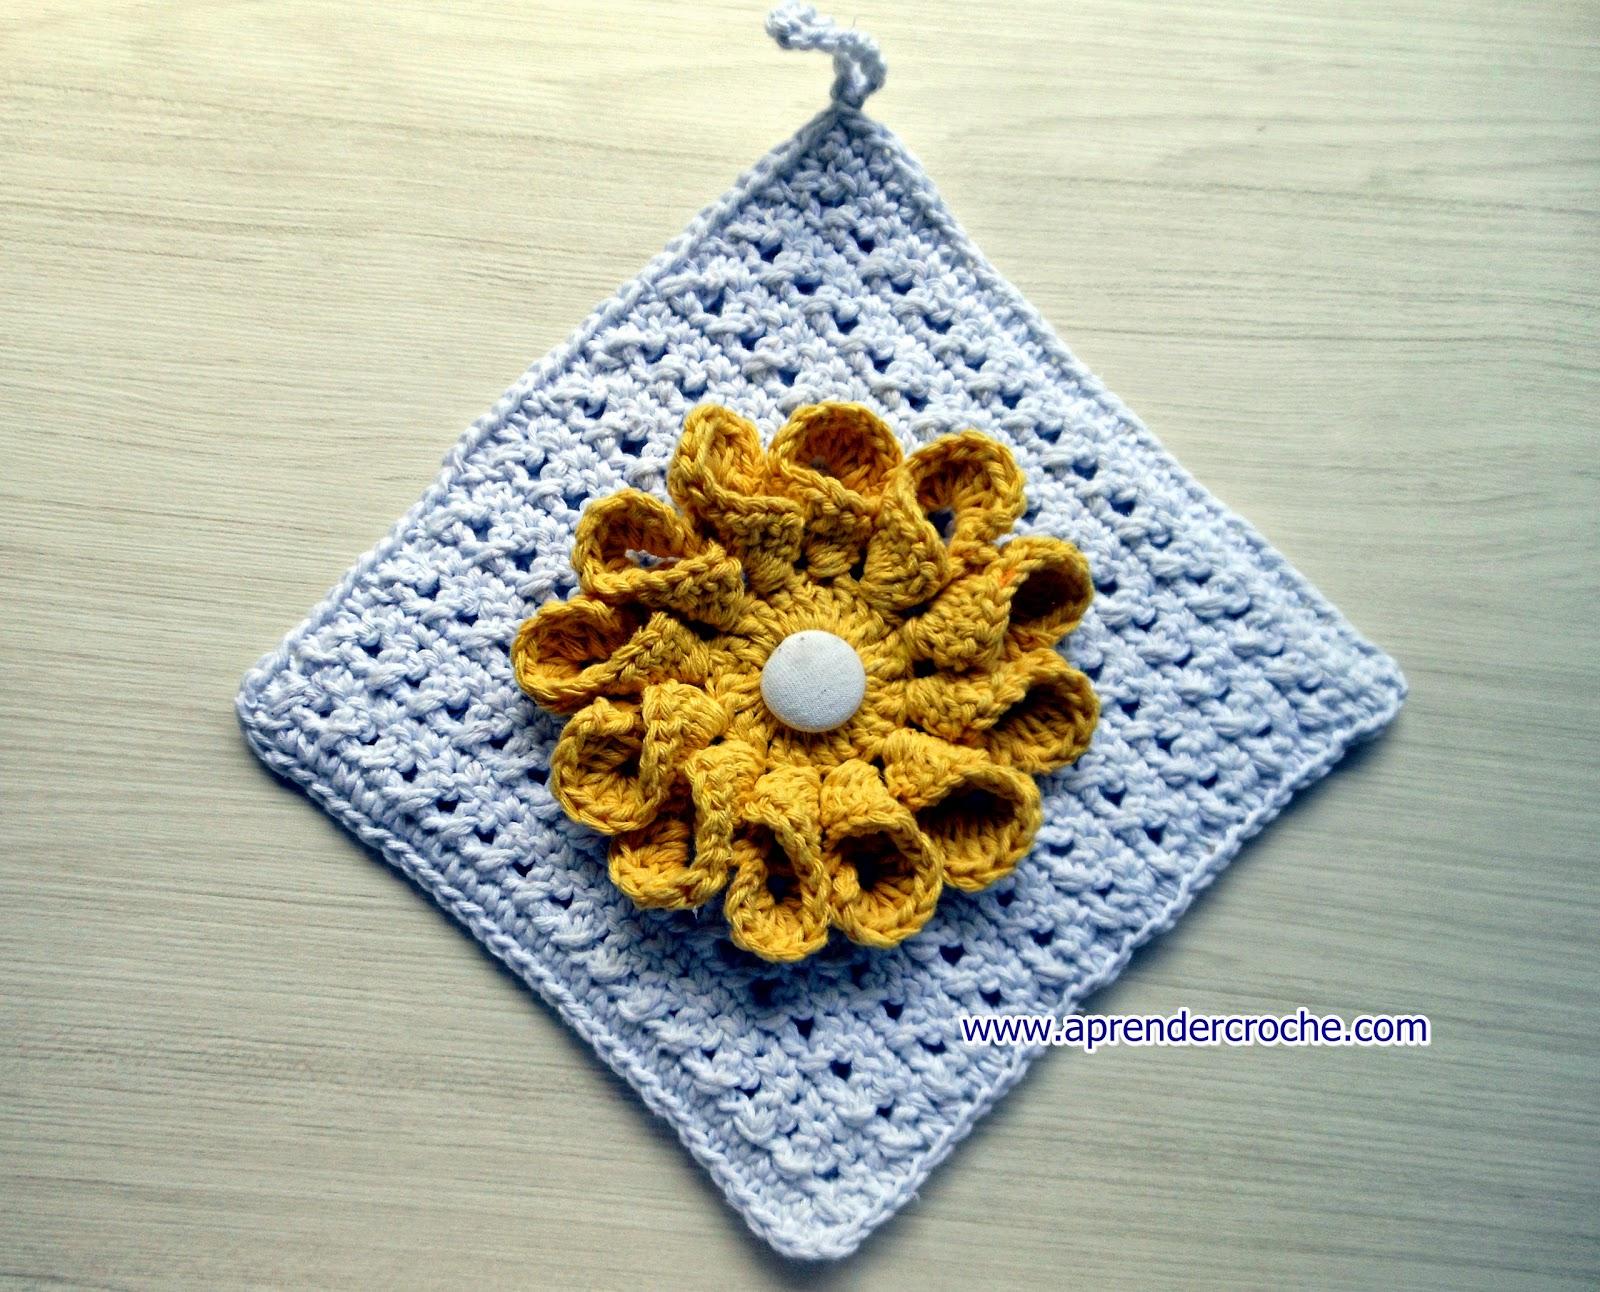 aprender croche pega panelas floral girassol dálias dvd video-aulas loja curso de croche frete gratis edinir-croche